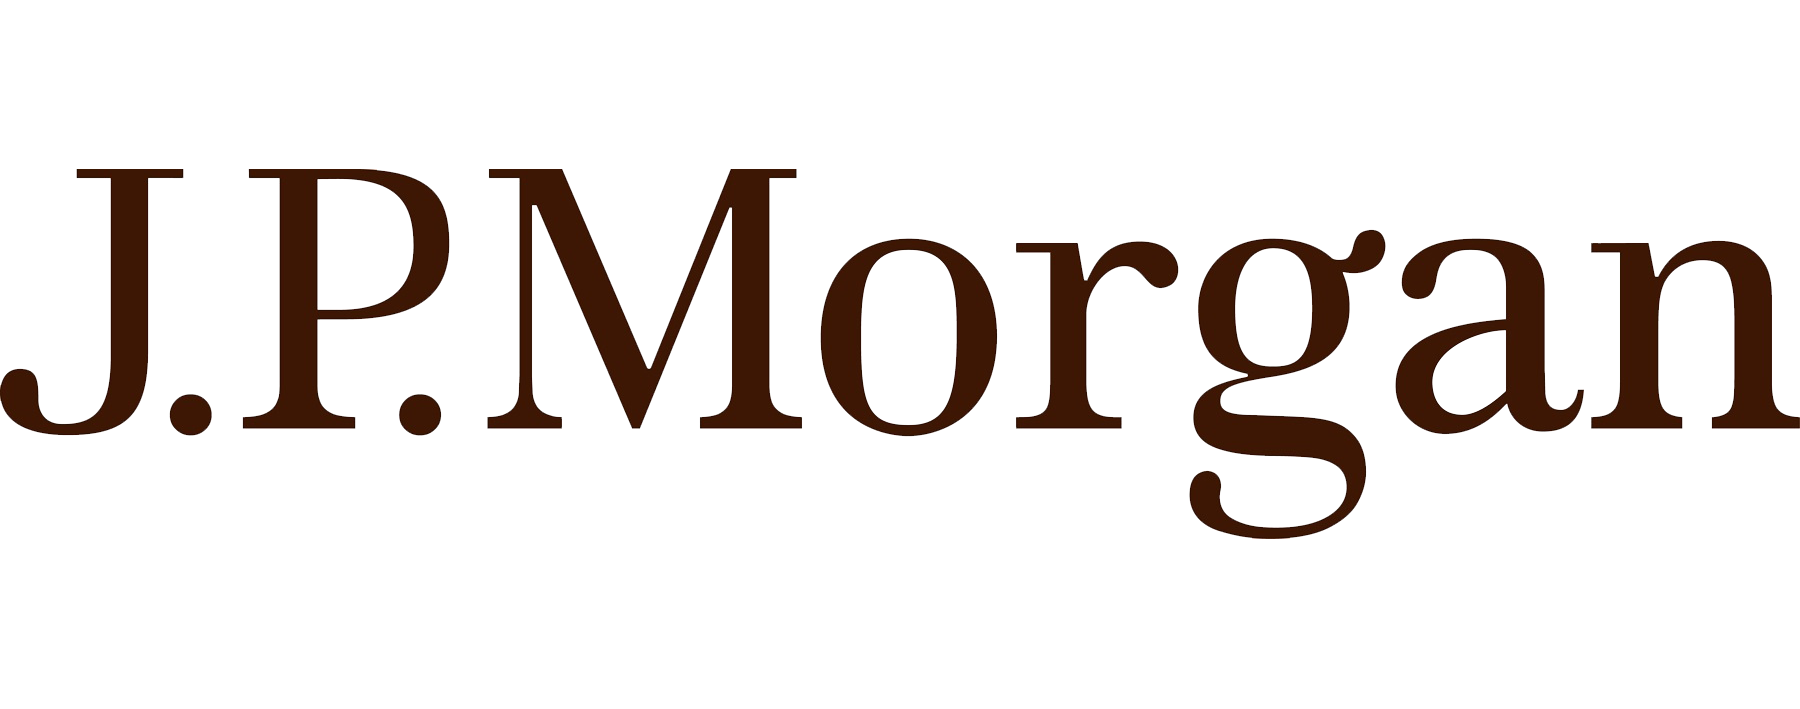 JPMorgan Chase Wave Analysis – 19 November, 2019